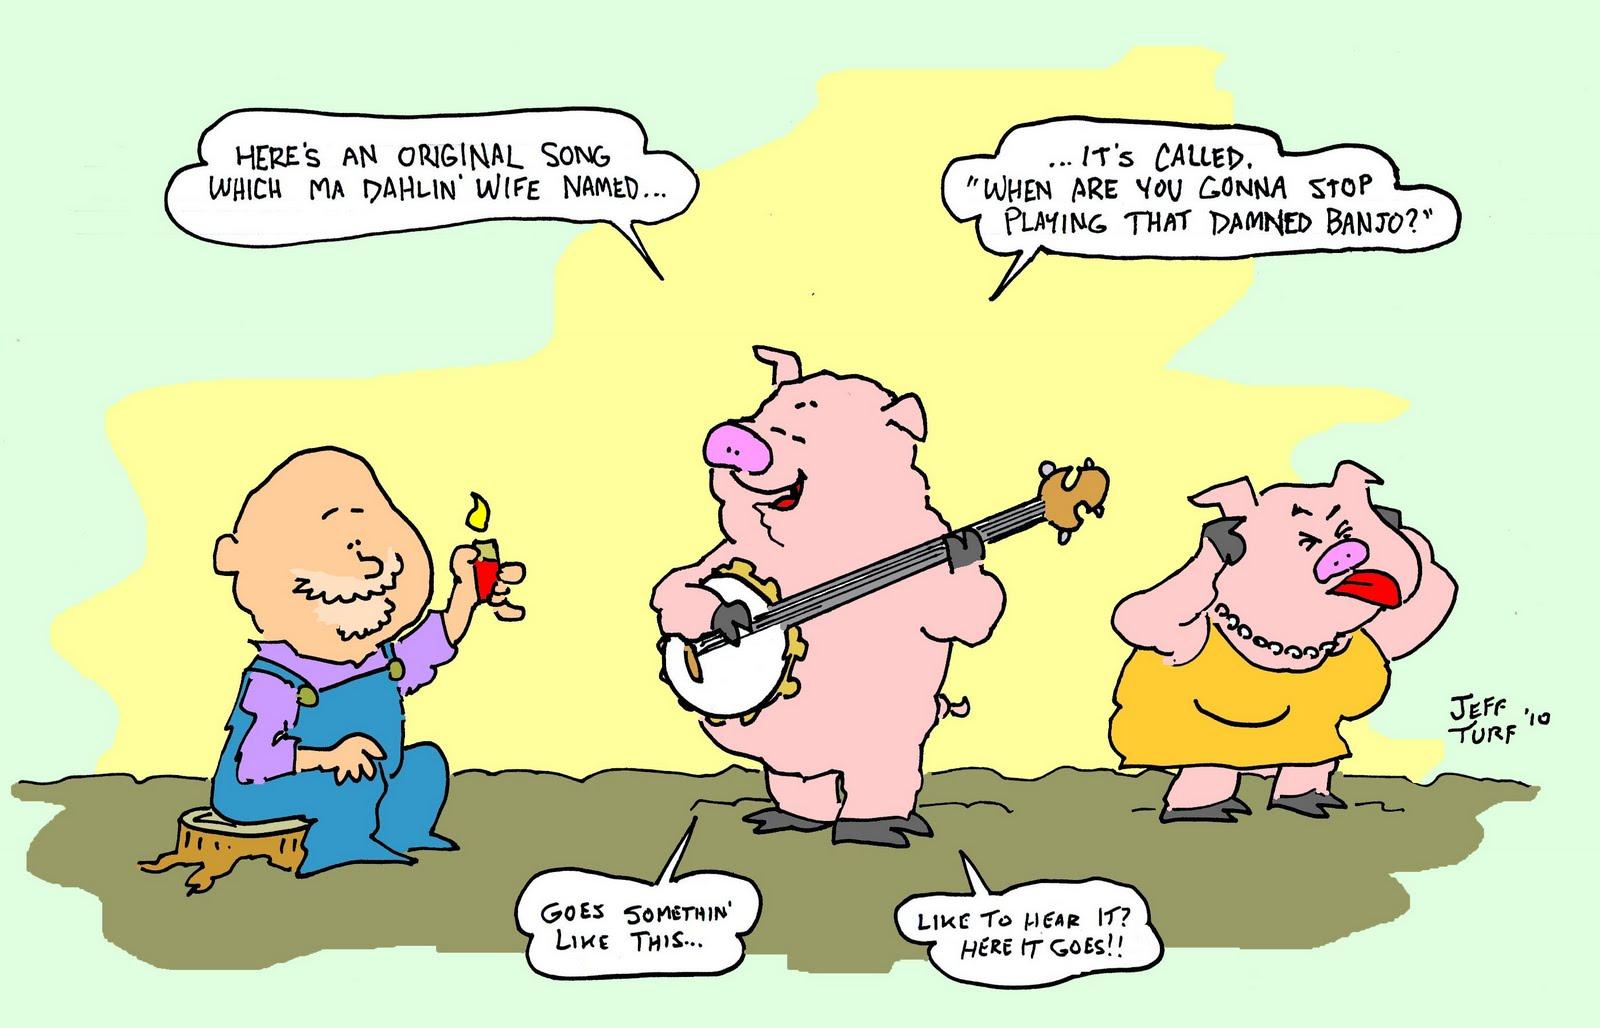 http://3.bp.blogspot.com/_pVCiTA86umk/TDSEOZUP8YI/AAAAAAAAHR4/s6XIfsFggl8/s1600/Jeff+Overturf+Banjo+Pig+c-007.jpg